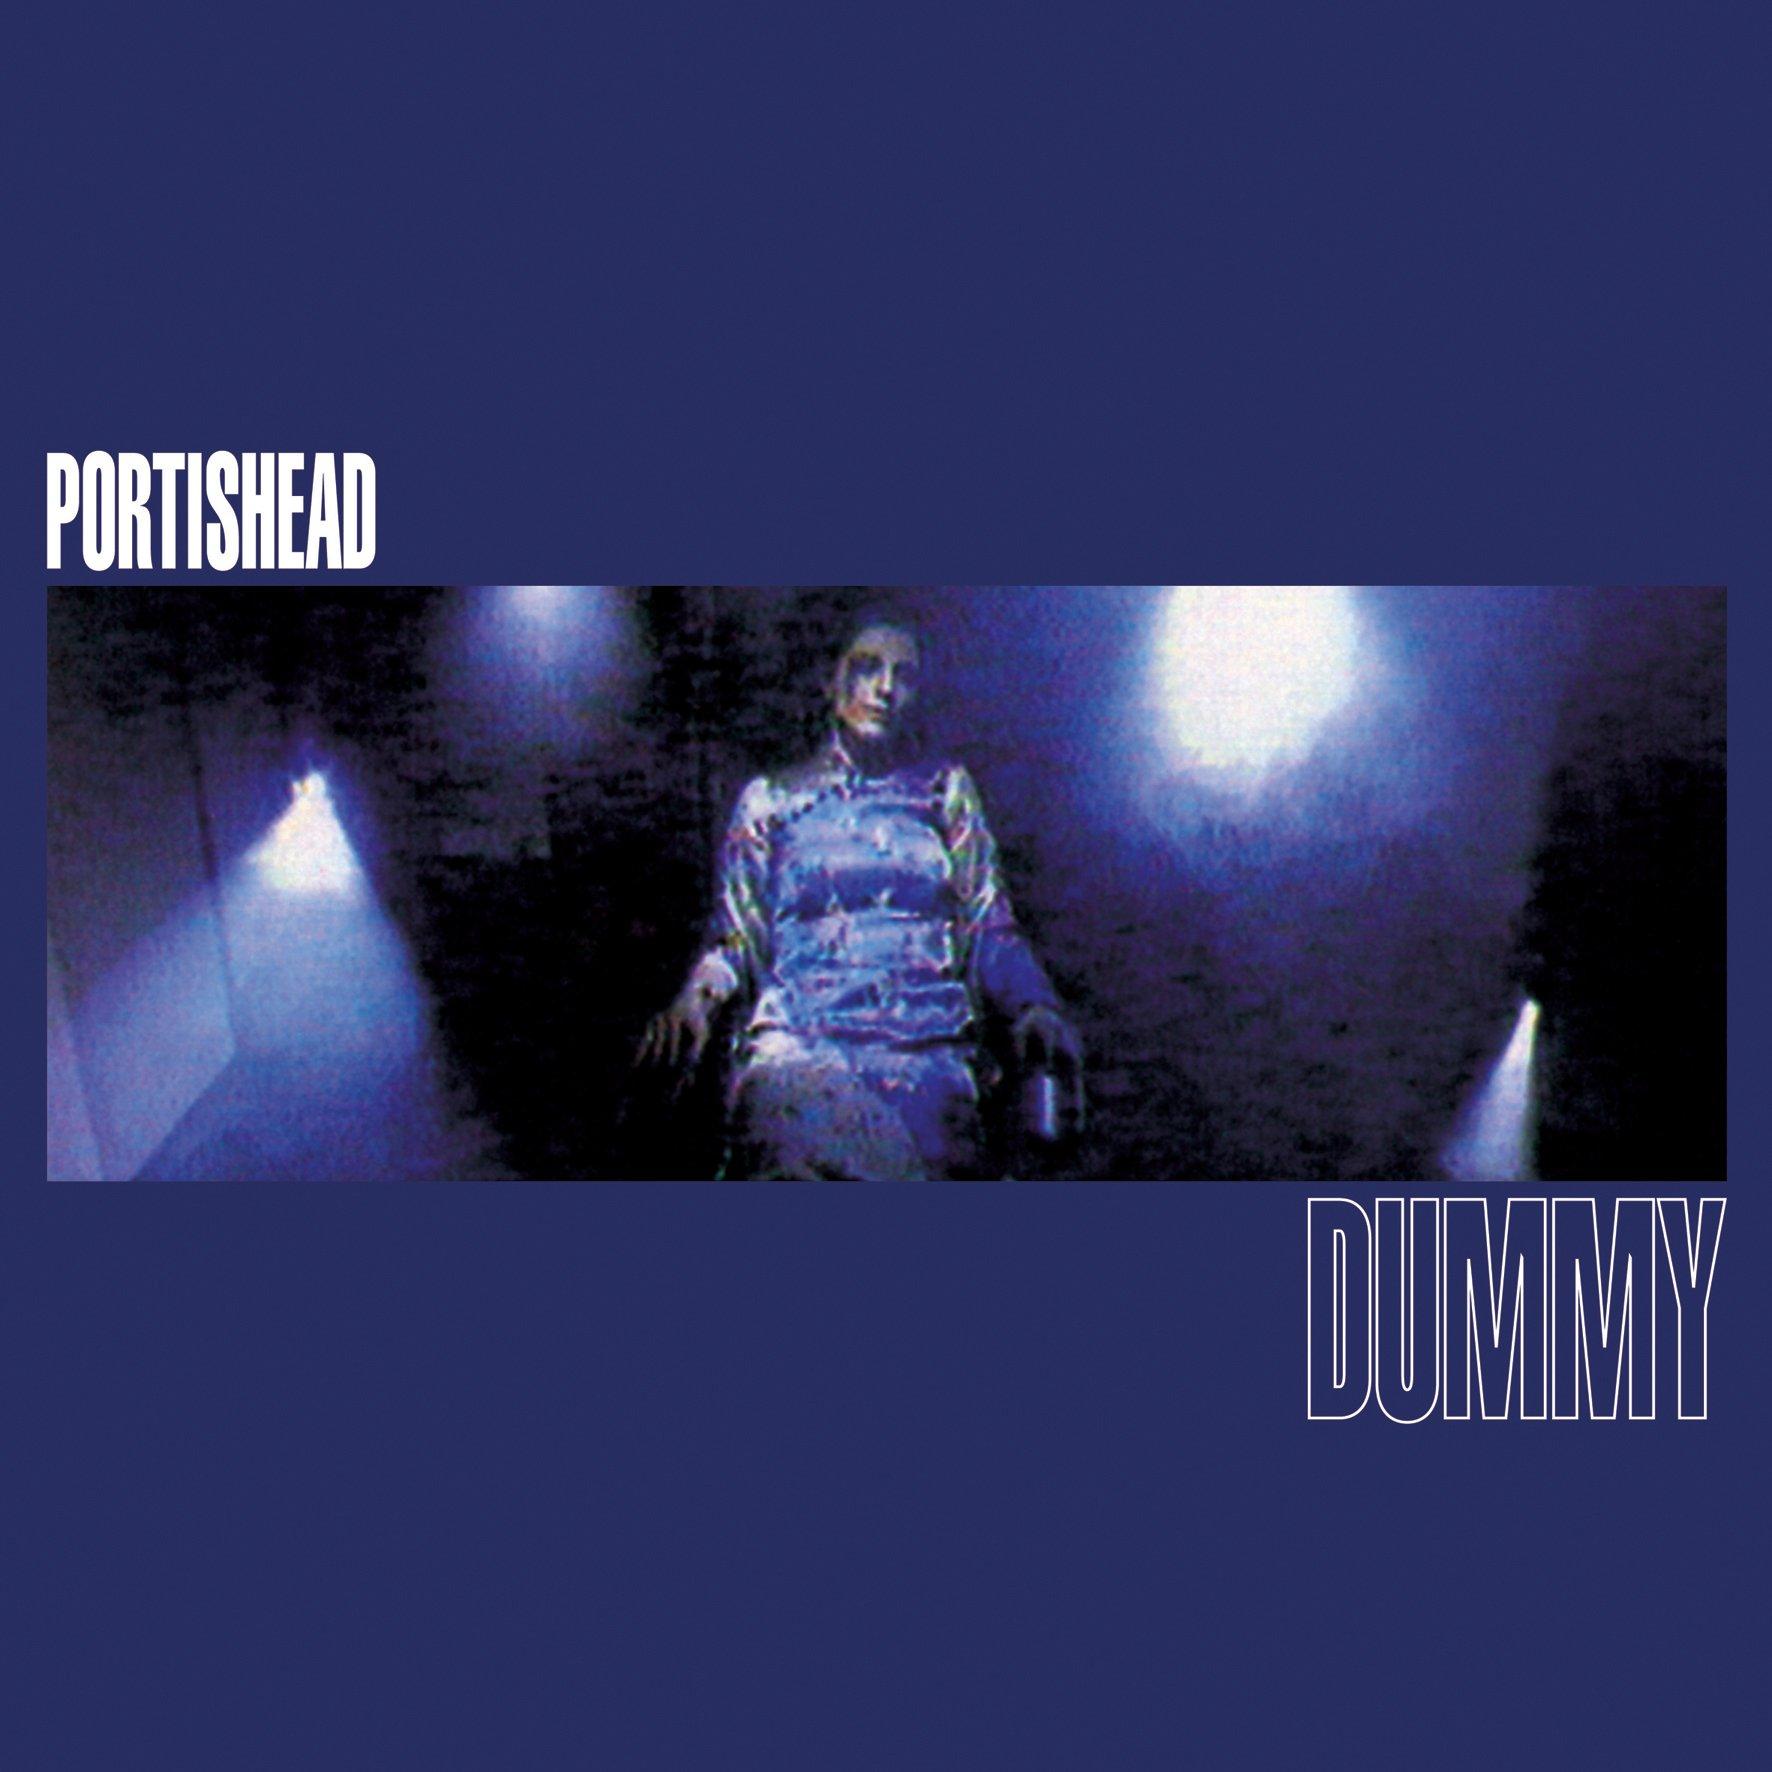 Buy Portishead - Dummy - LP - Incl. shipping